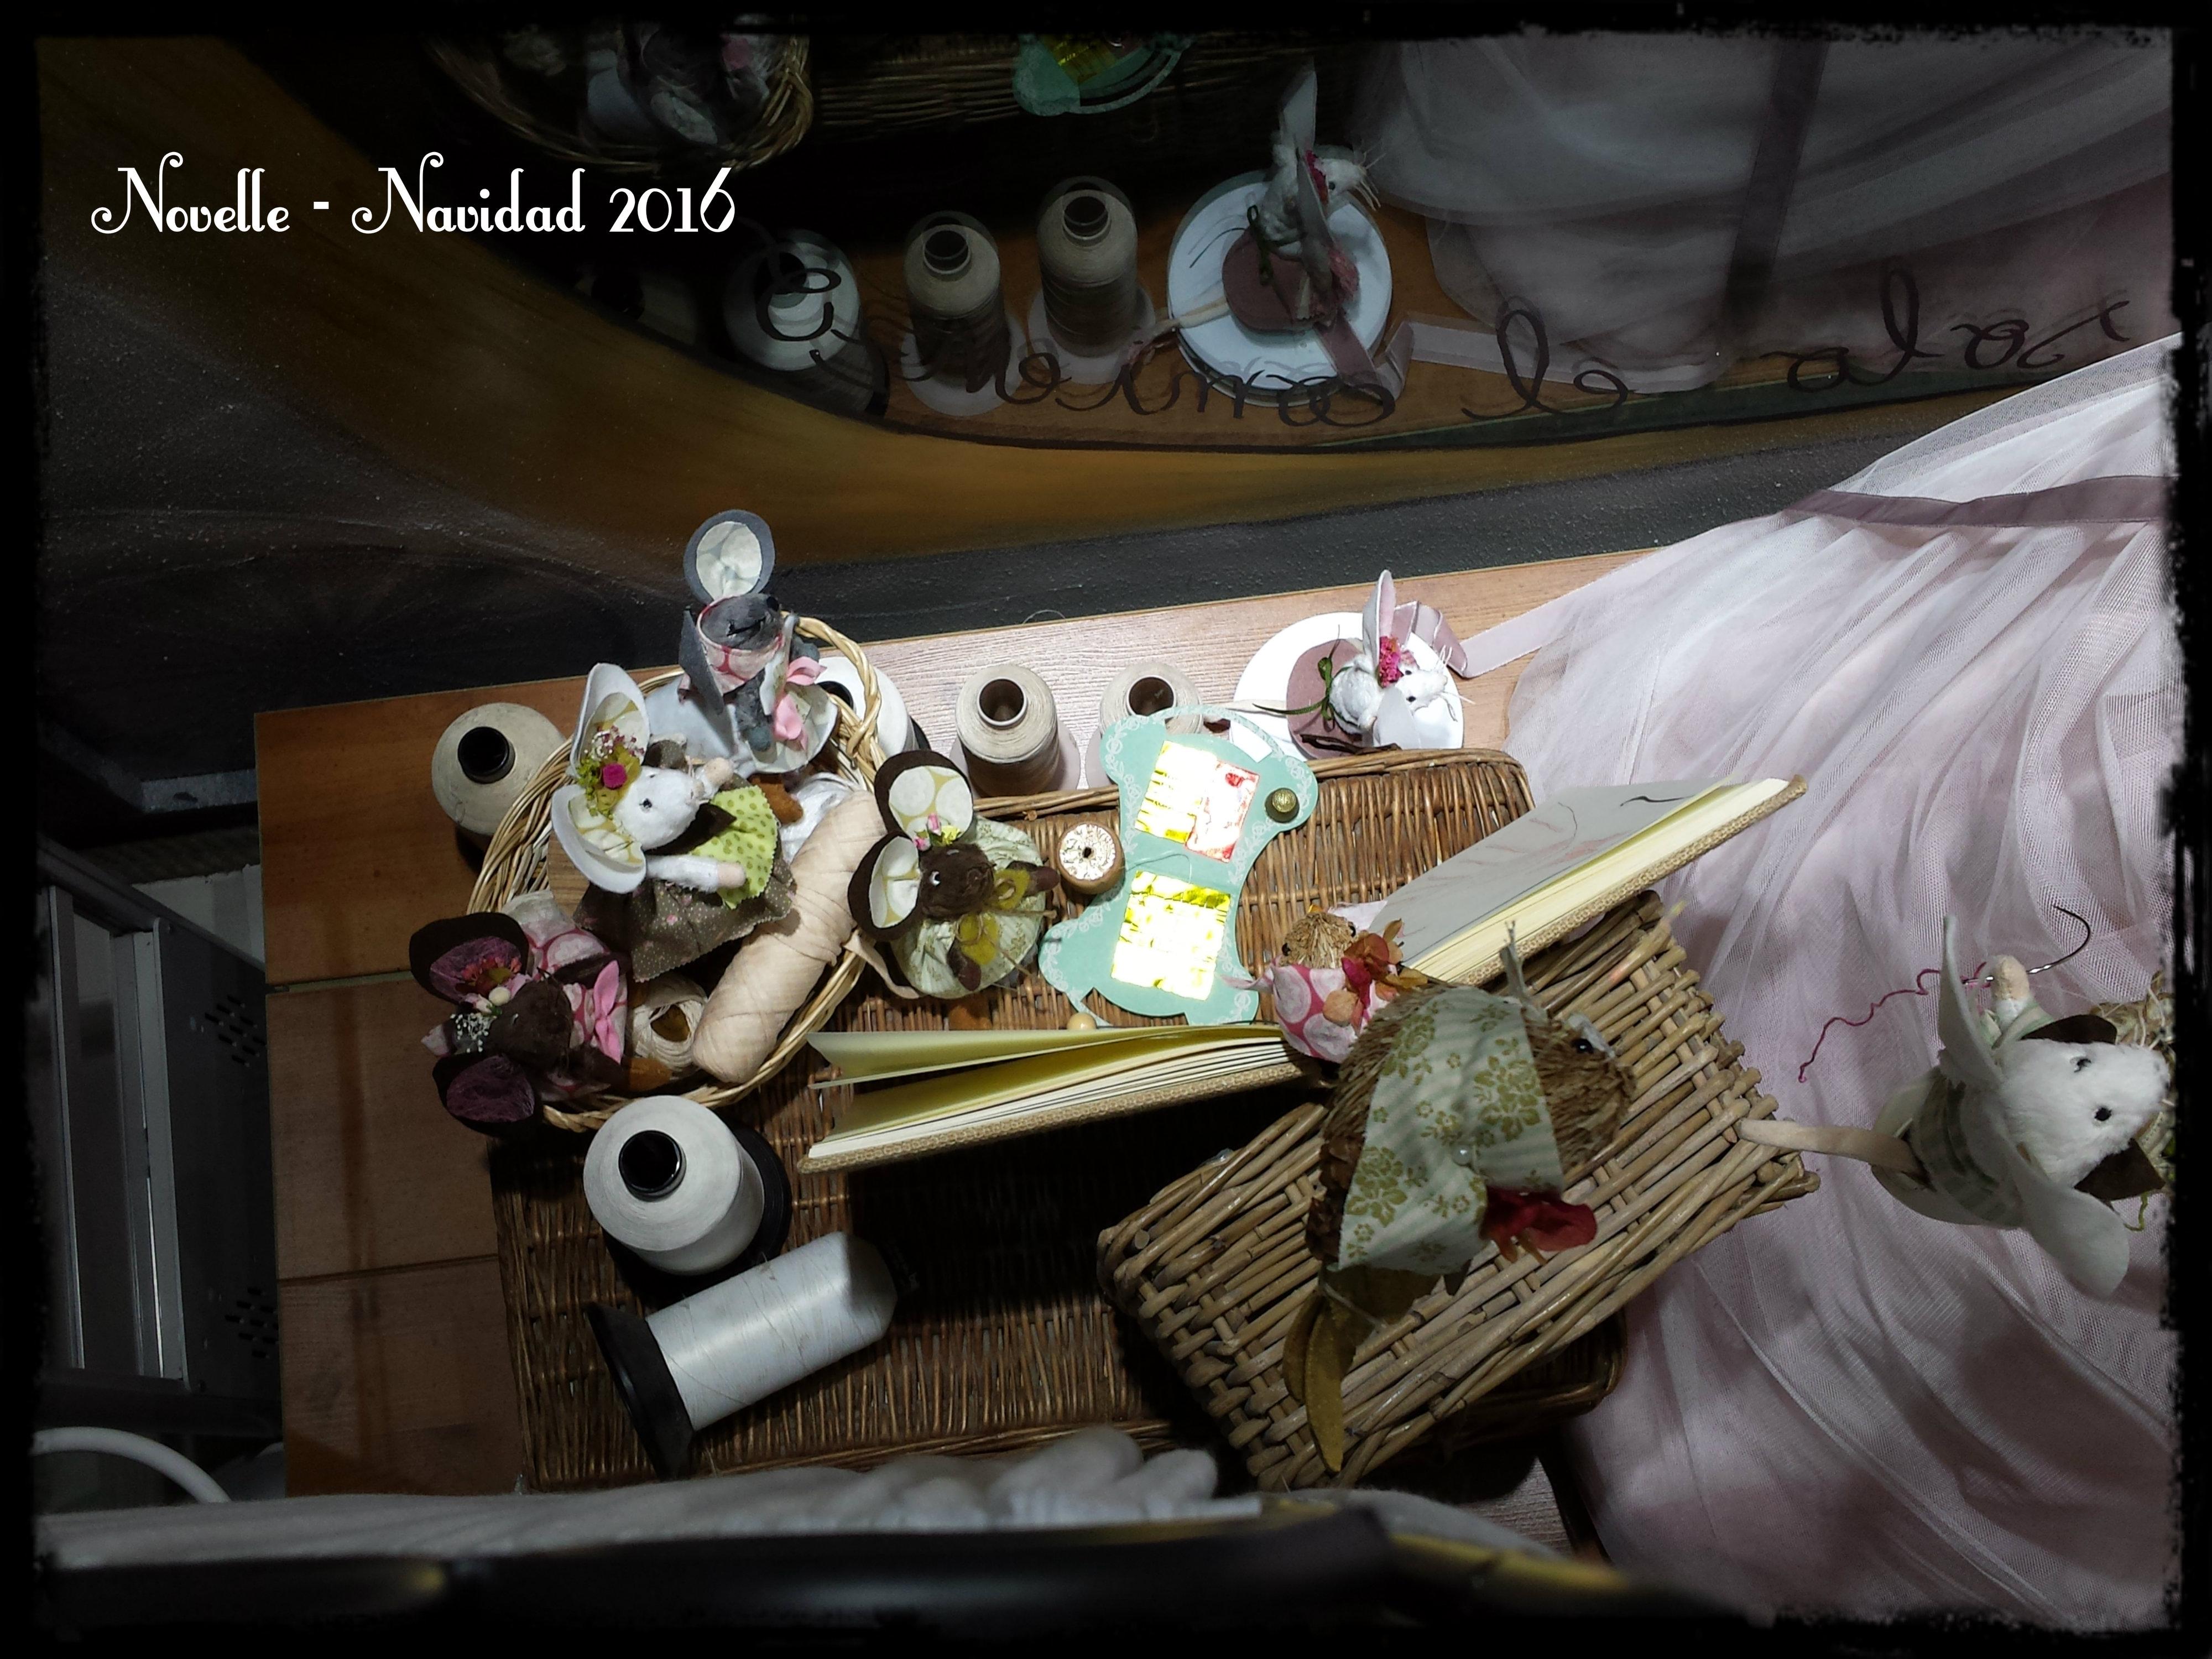 novelle-escaparate-navidad-2016-cenicienta-10